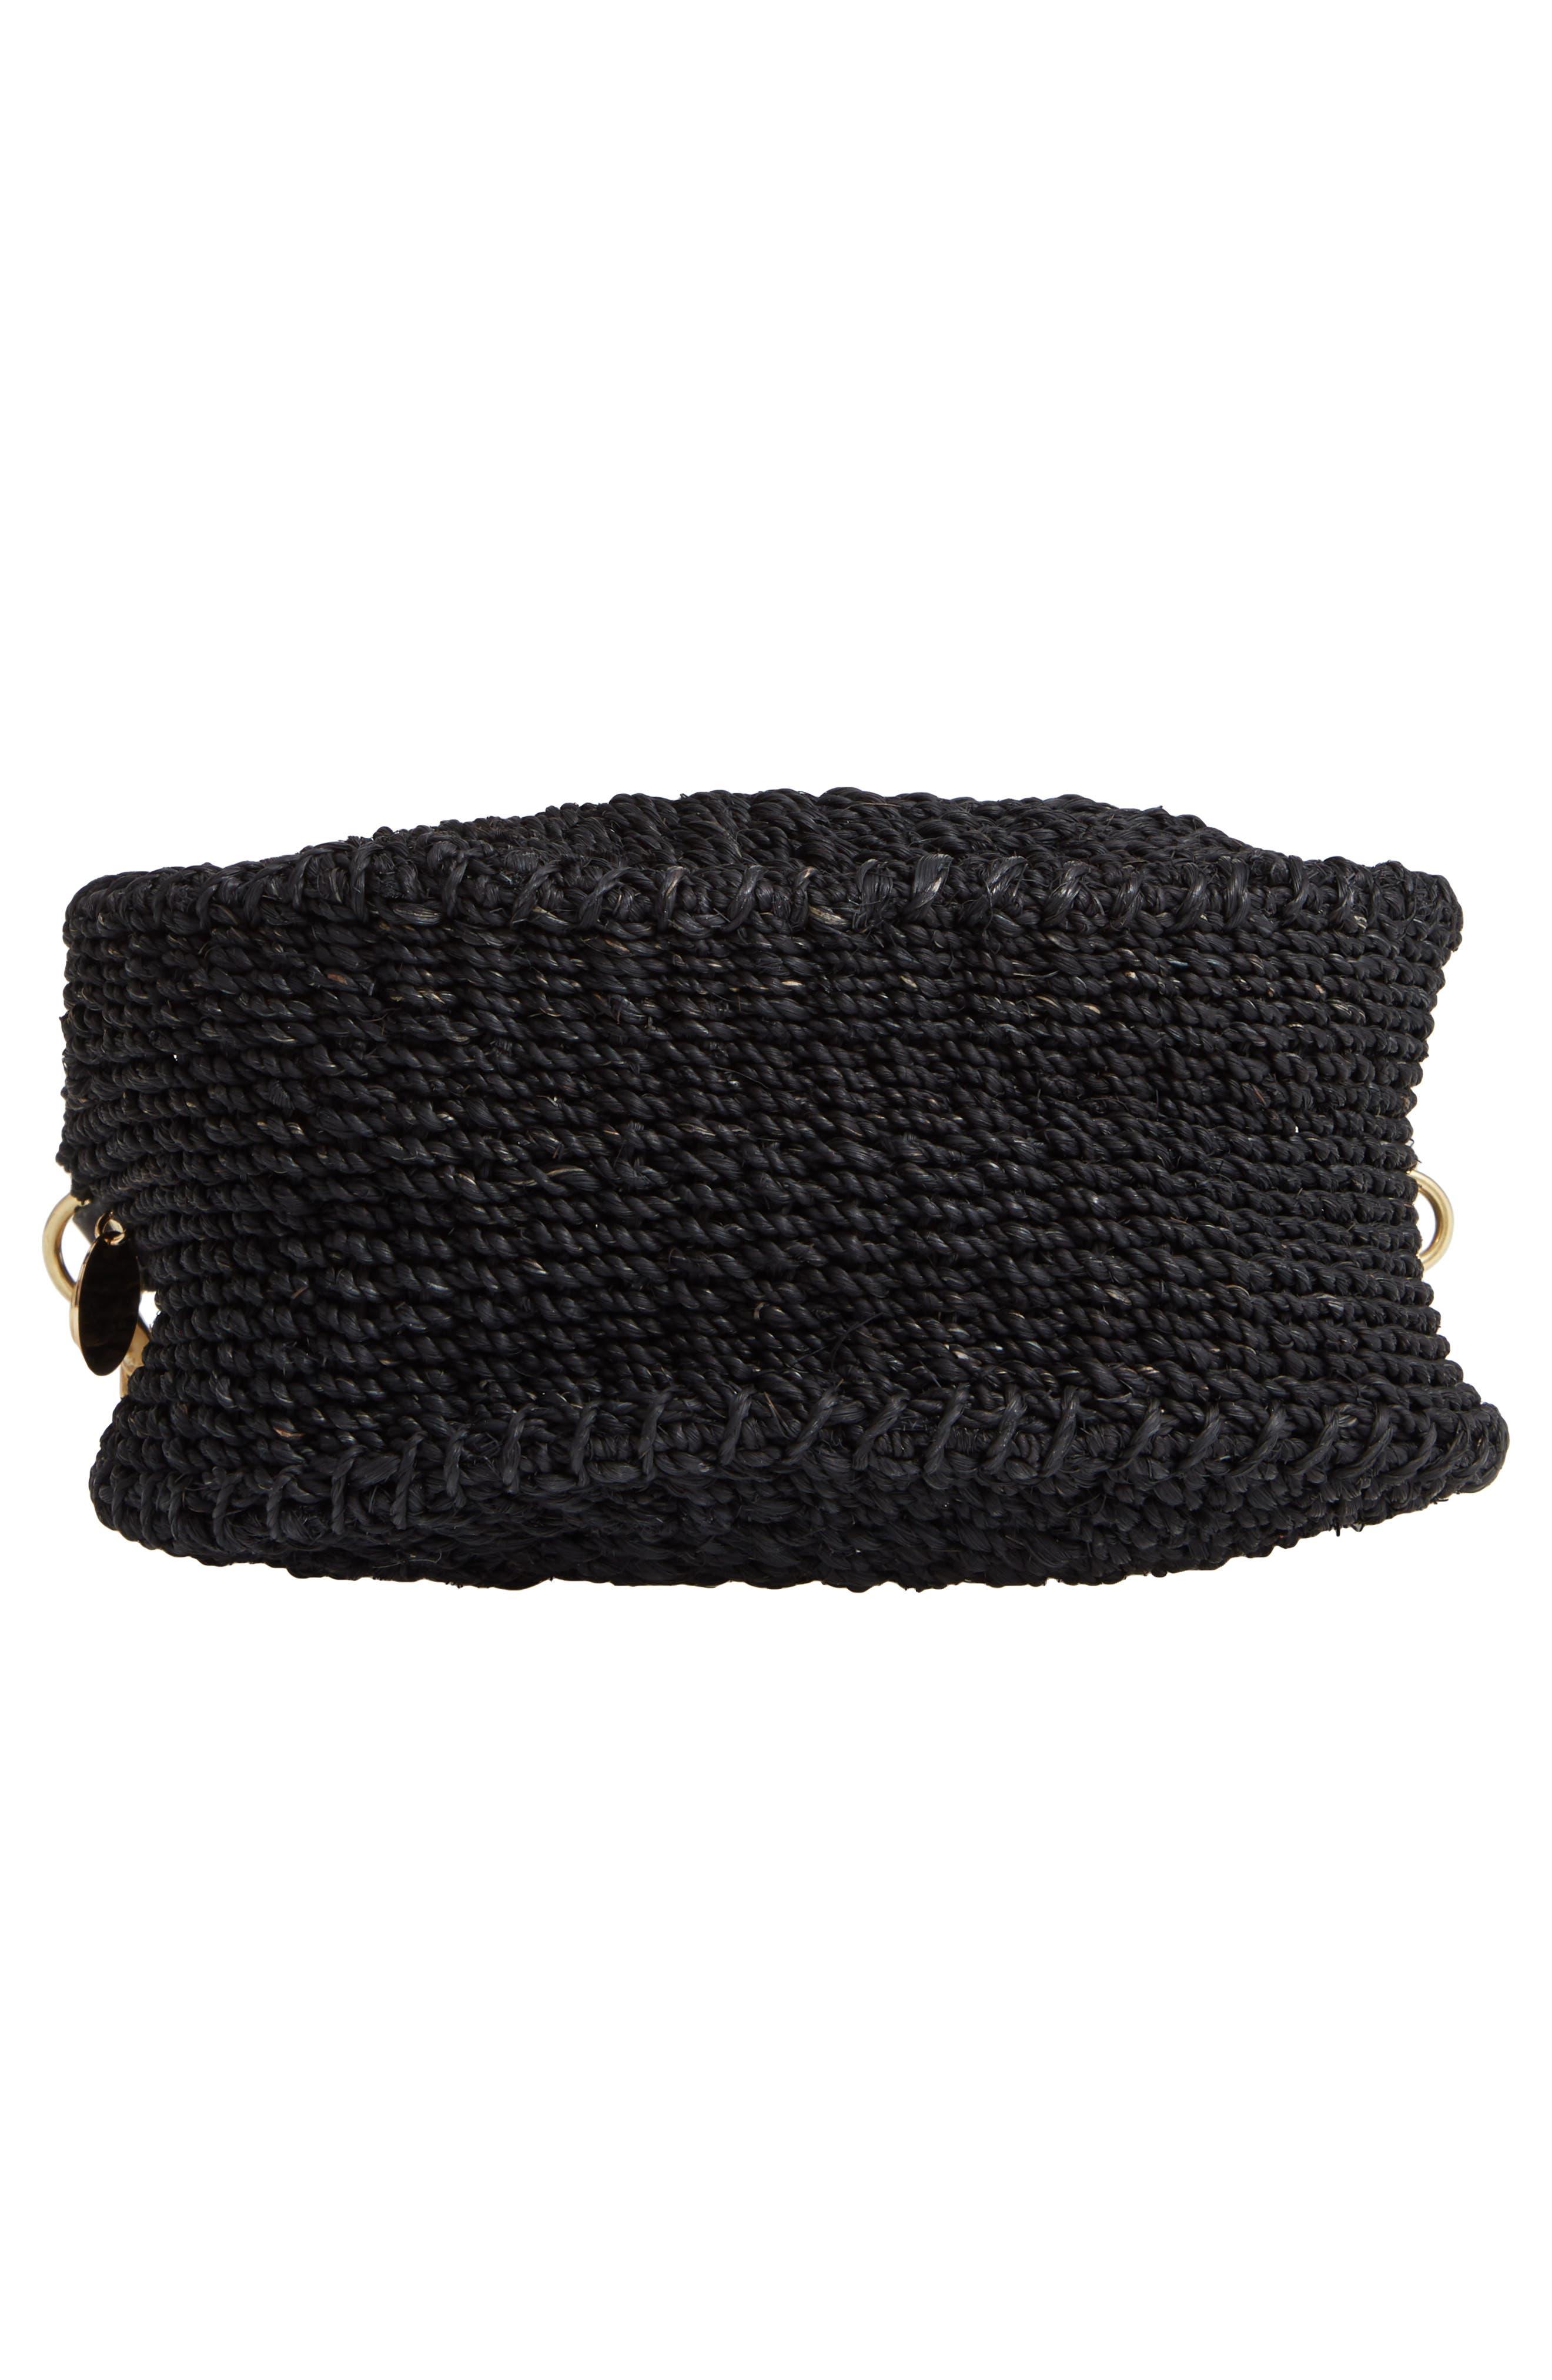 Petite Alice Straw Bag,                             Alternate thumbnail 6, color,                             BLACK